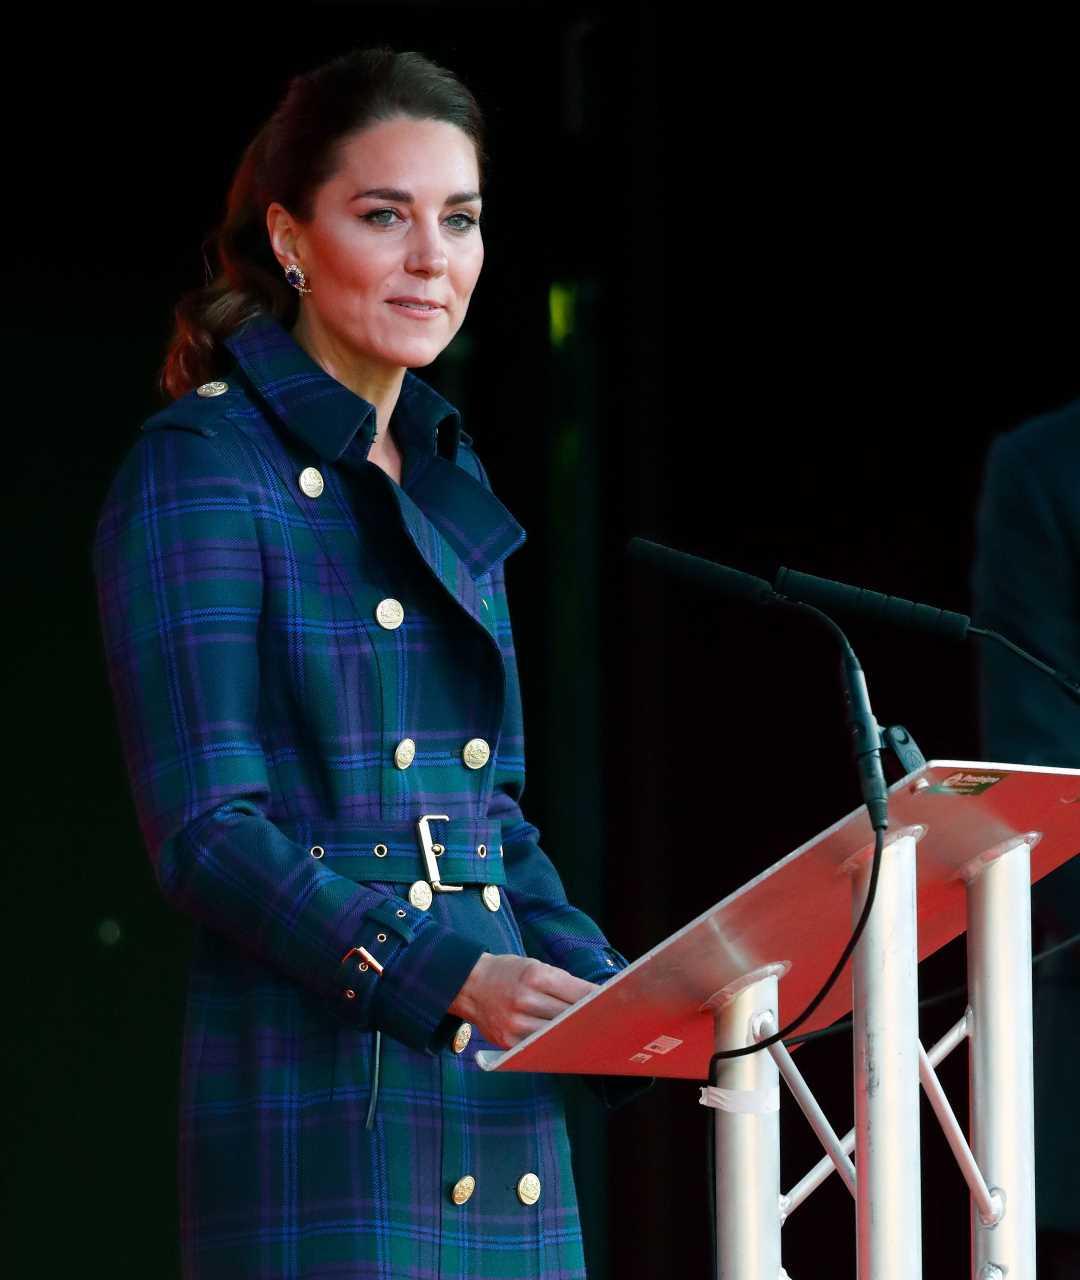 Kate Middleton se estrena en el G7 junto a Jill Biden